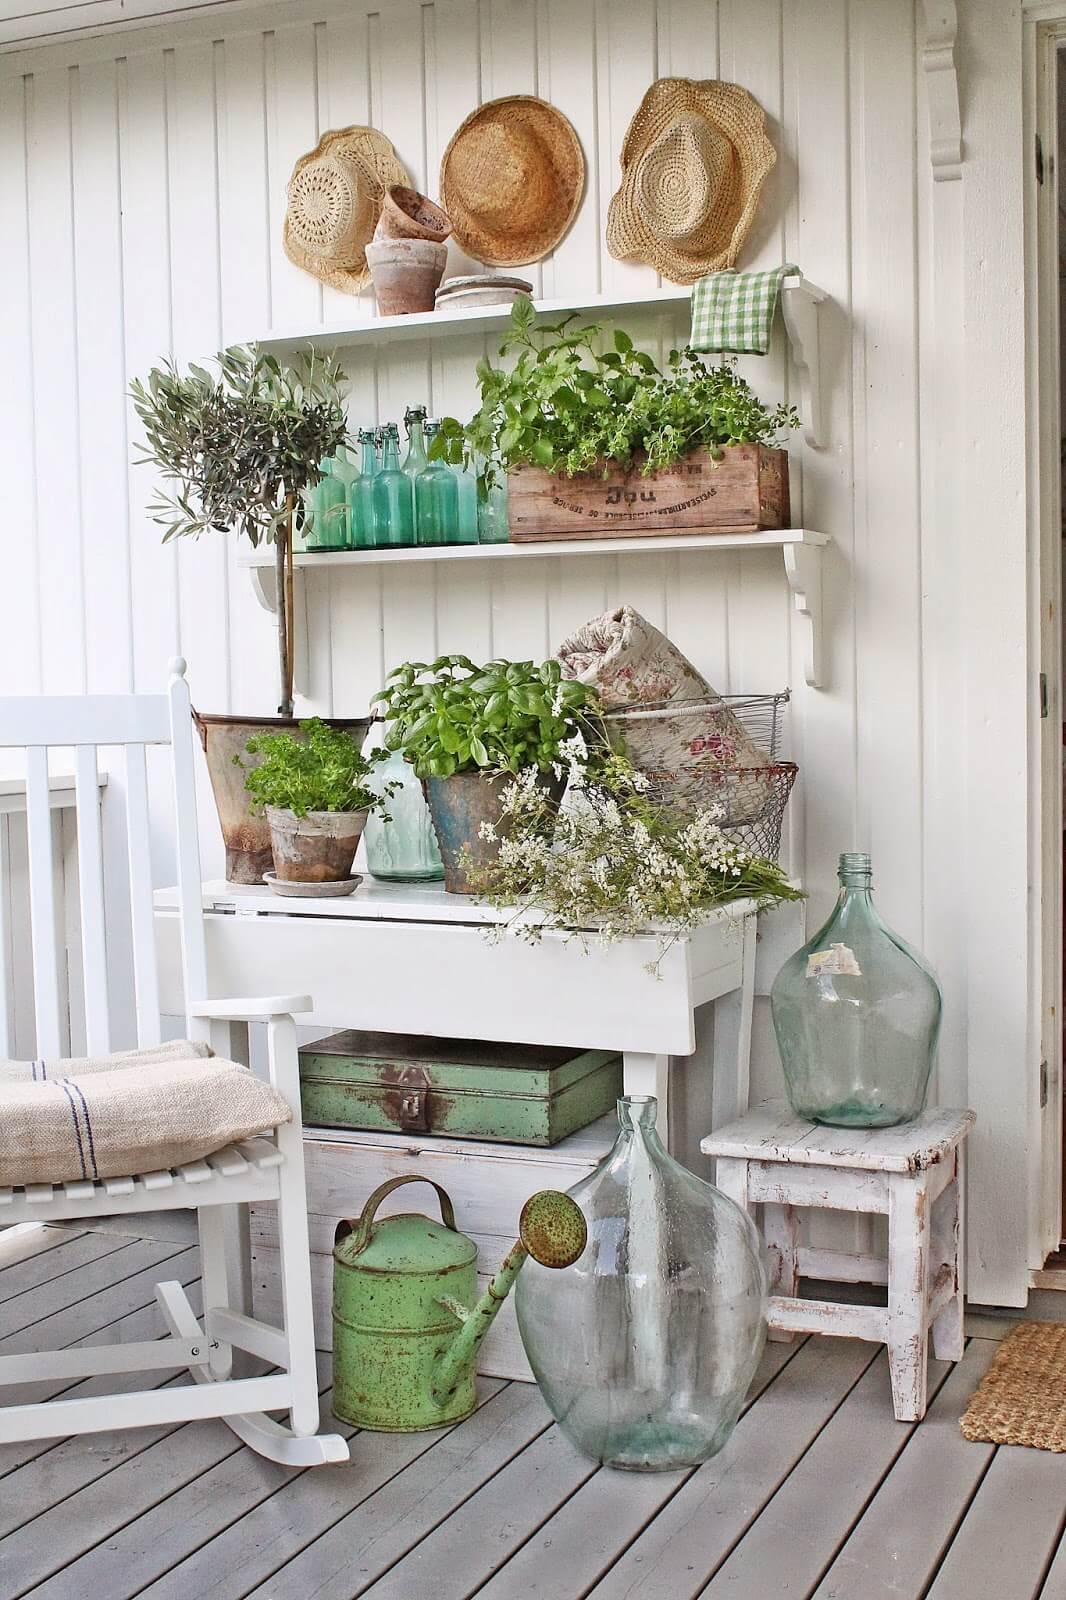 47 Best Rustic Farmhouse Porch Decor Ideas and Designs for ... on Farmhouse Yard Ideas id=84609